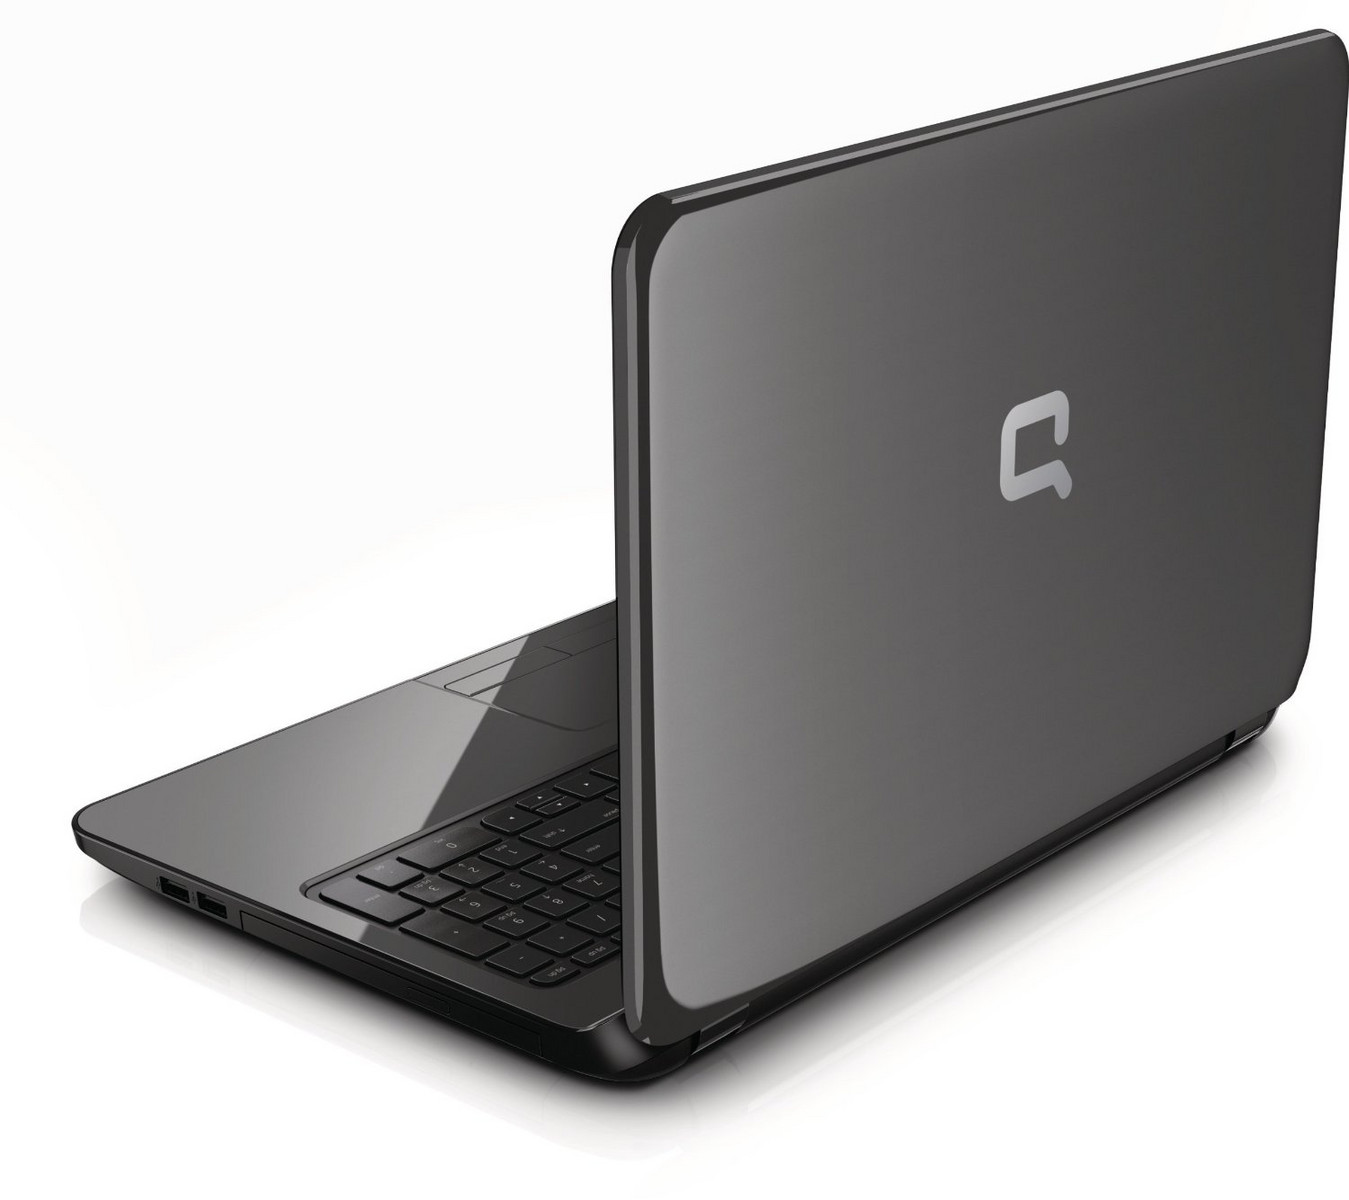 HP Compaq 15-h015ng - Notebookcheck.com Externe Tests